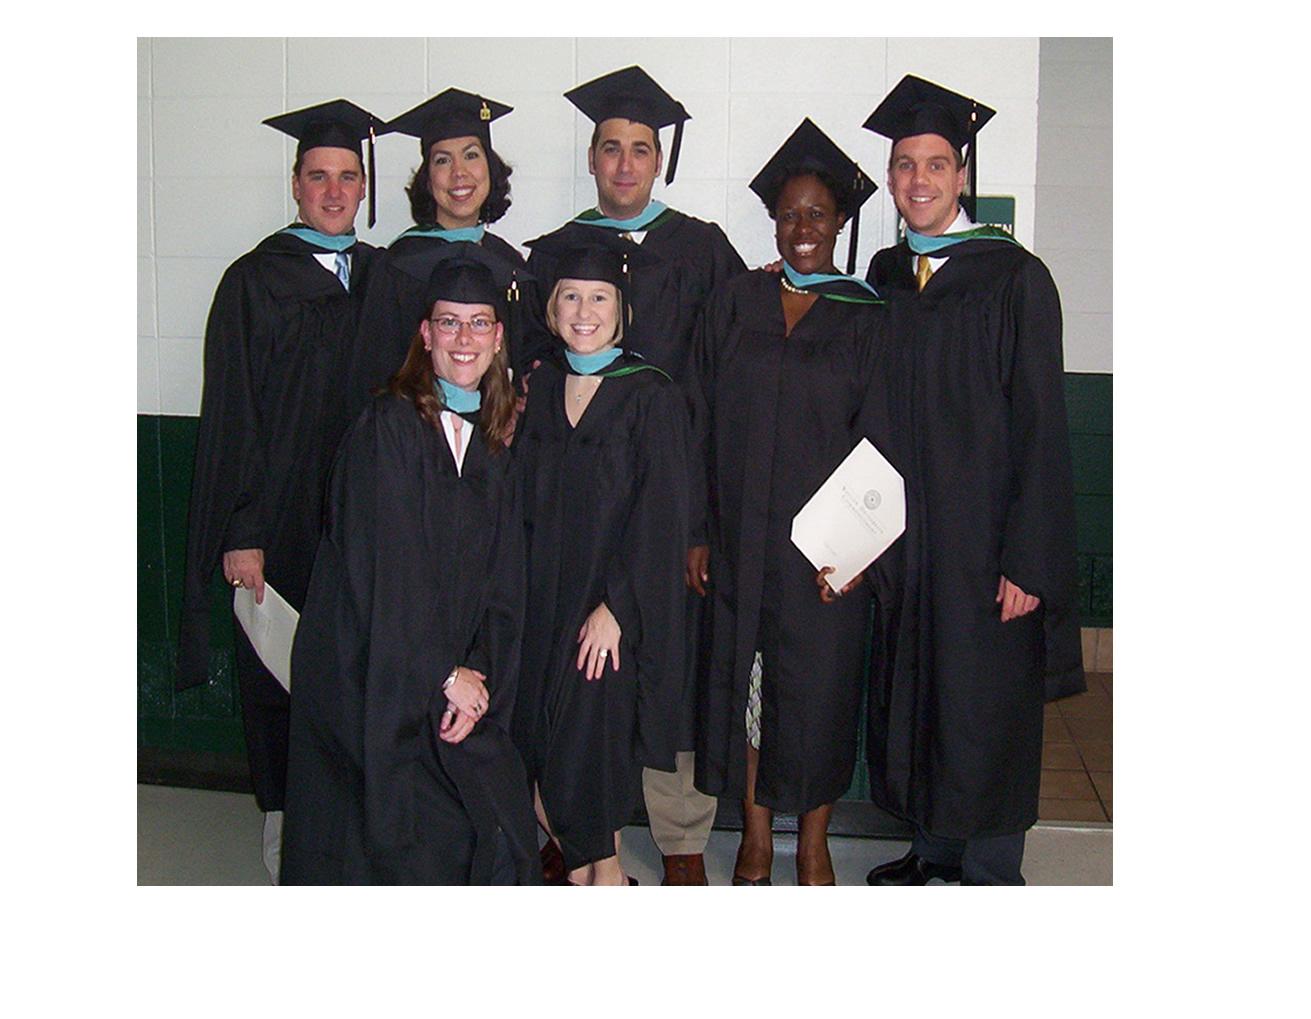 2003 Cohort